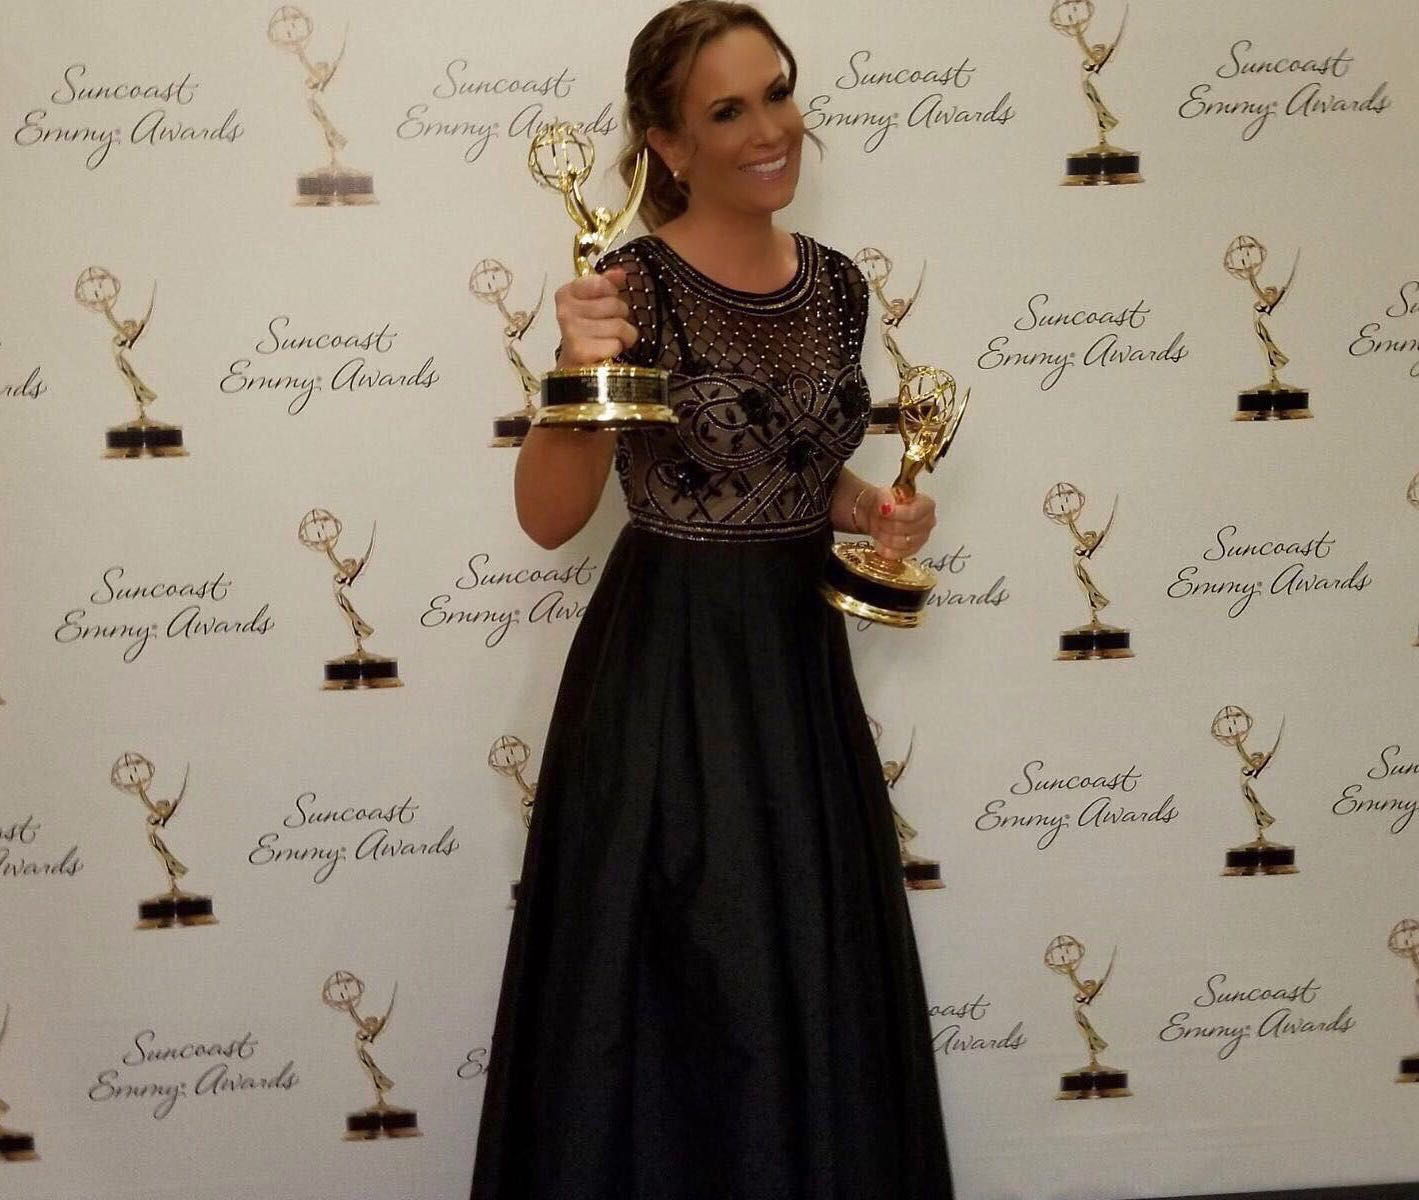 Fotografia Natalia Denegri acumula tres Emmy Awards